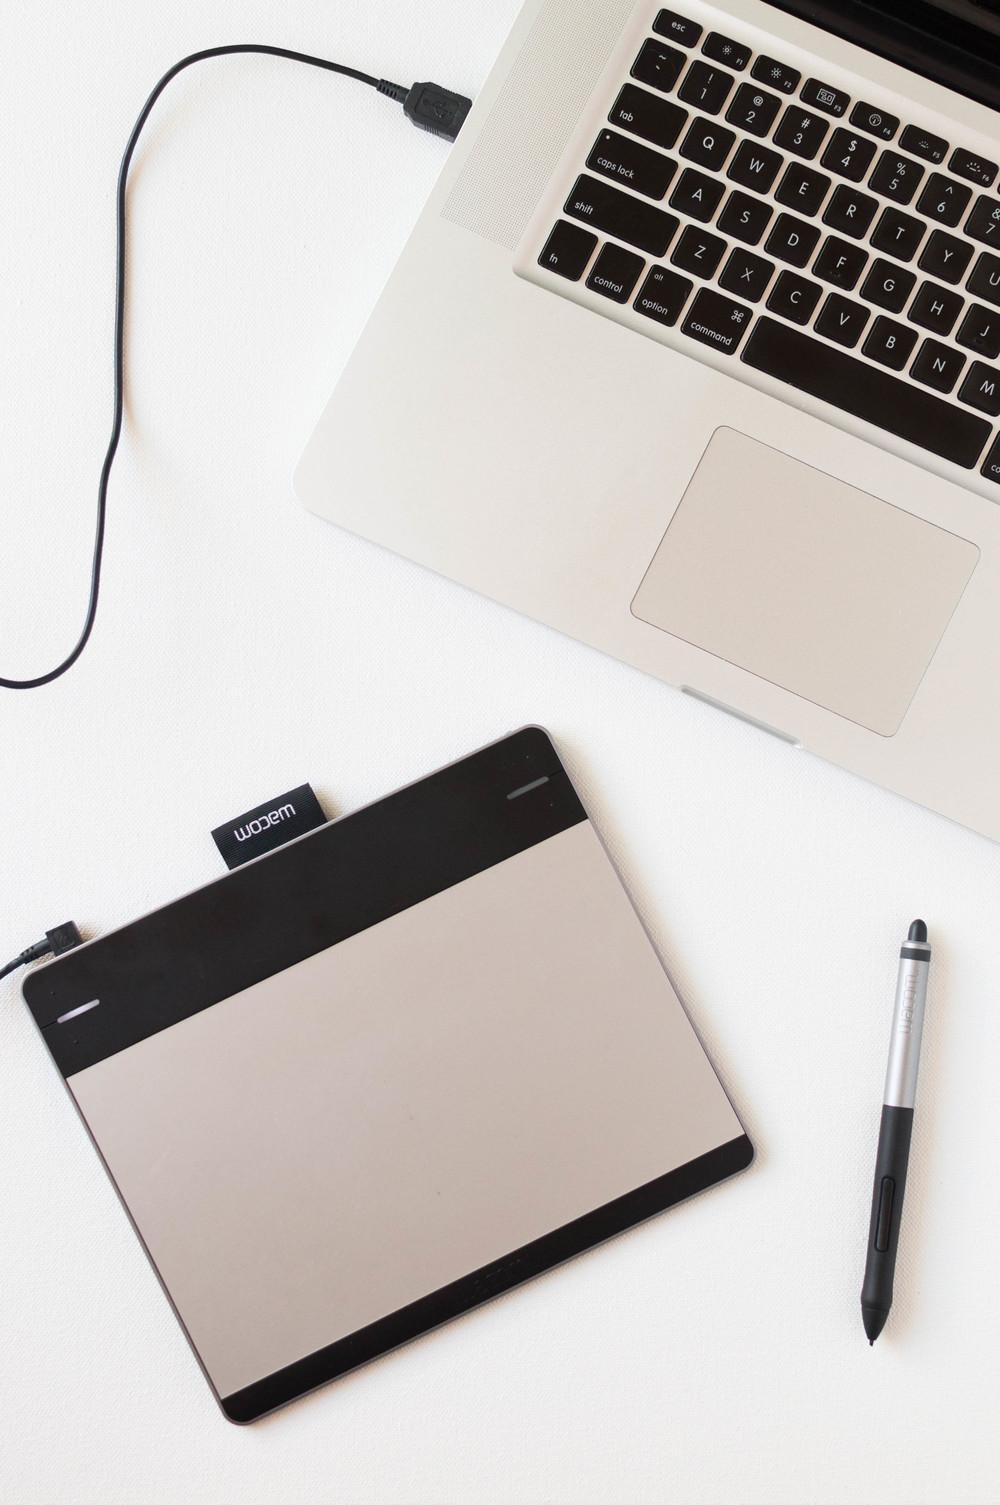 Wacom Tablet for Surface Pattern Design